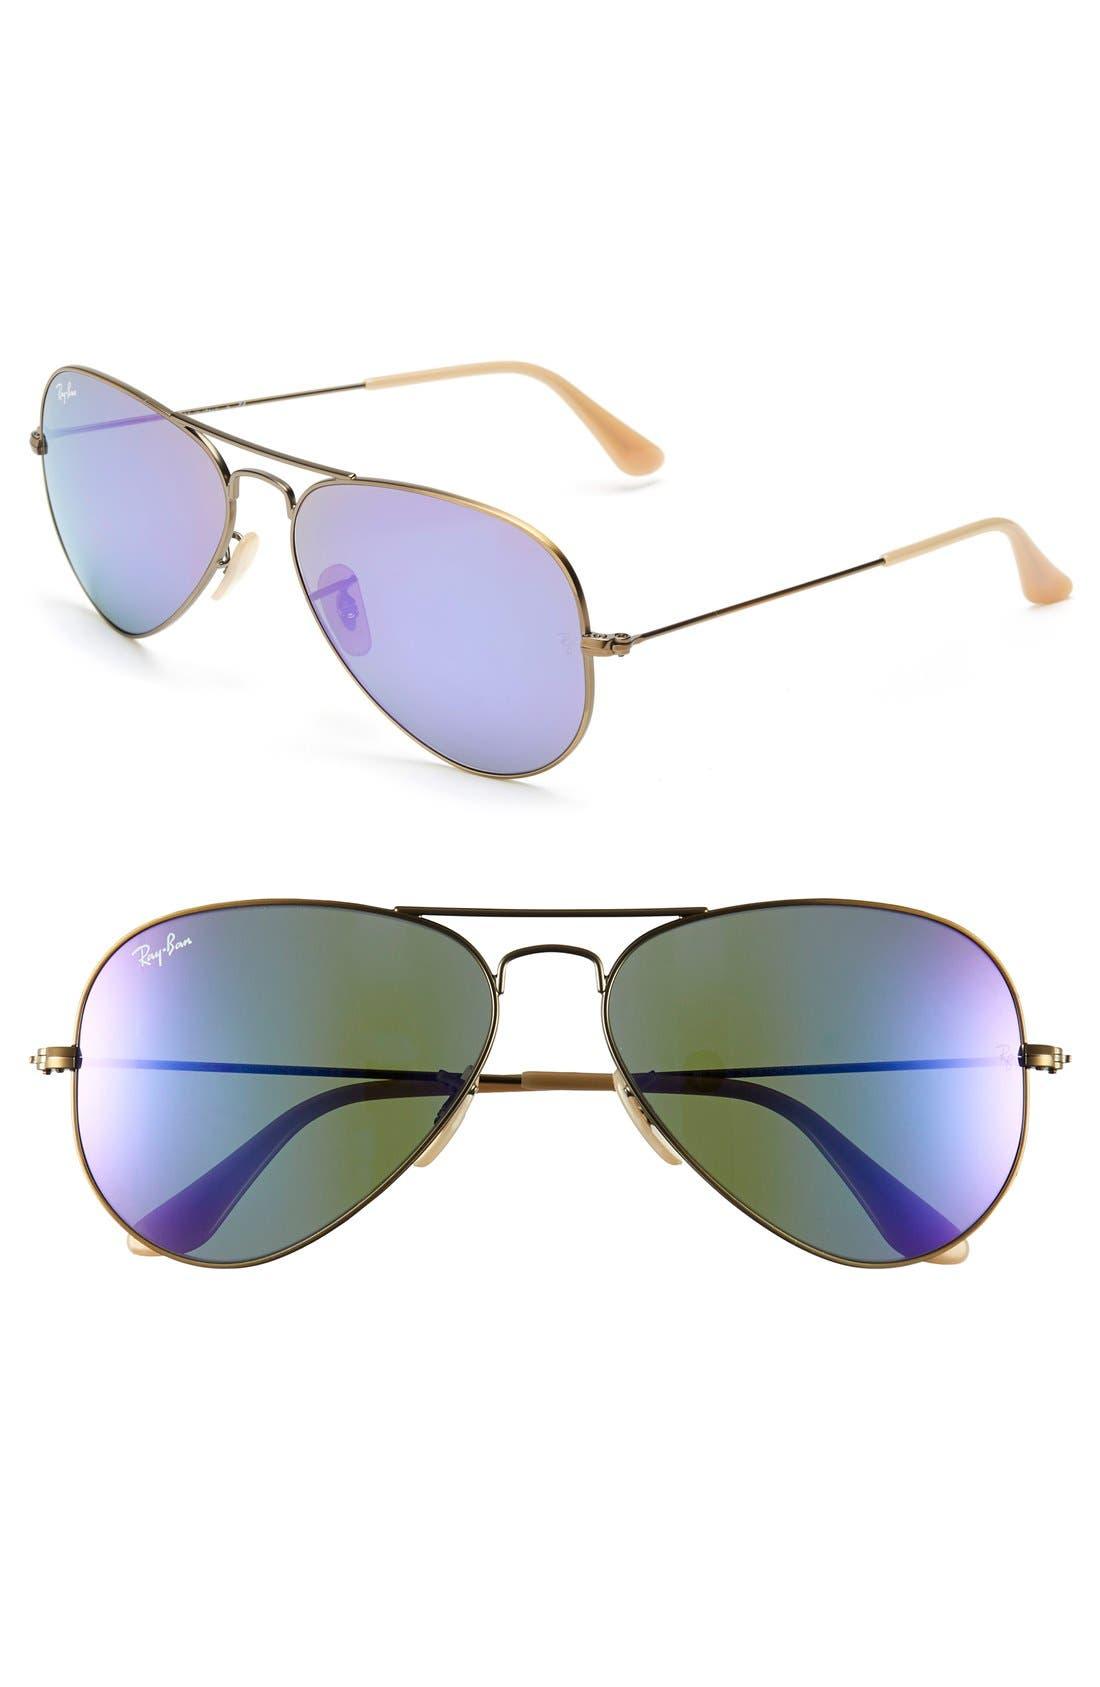 Alternate Image 1 Selected - Ray-Ban Standard Original 58mm Aviator Sunglasses